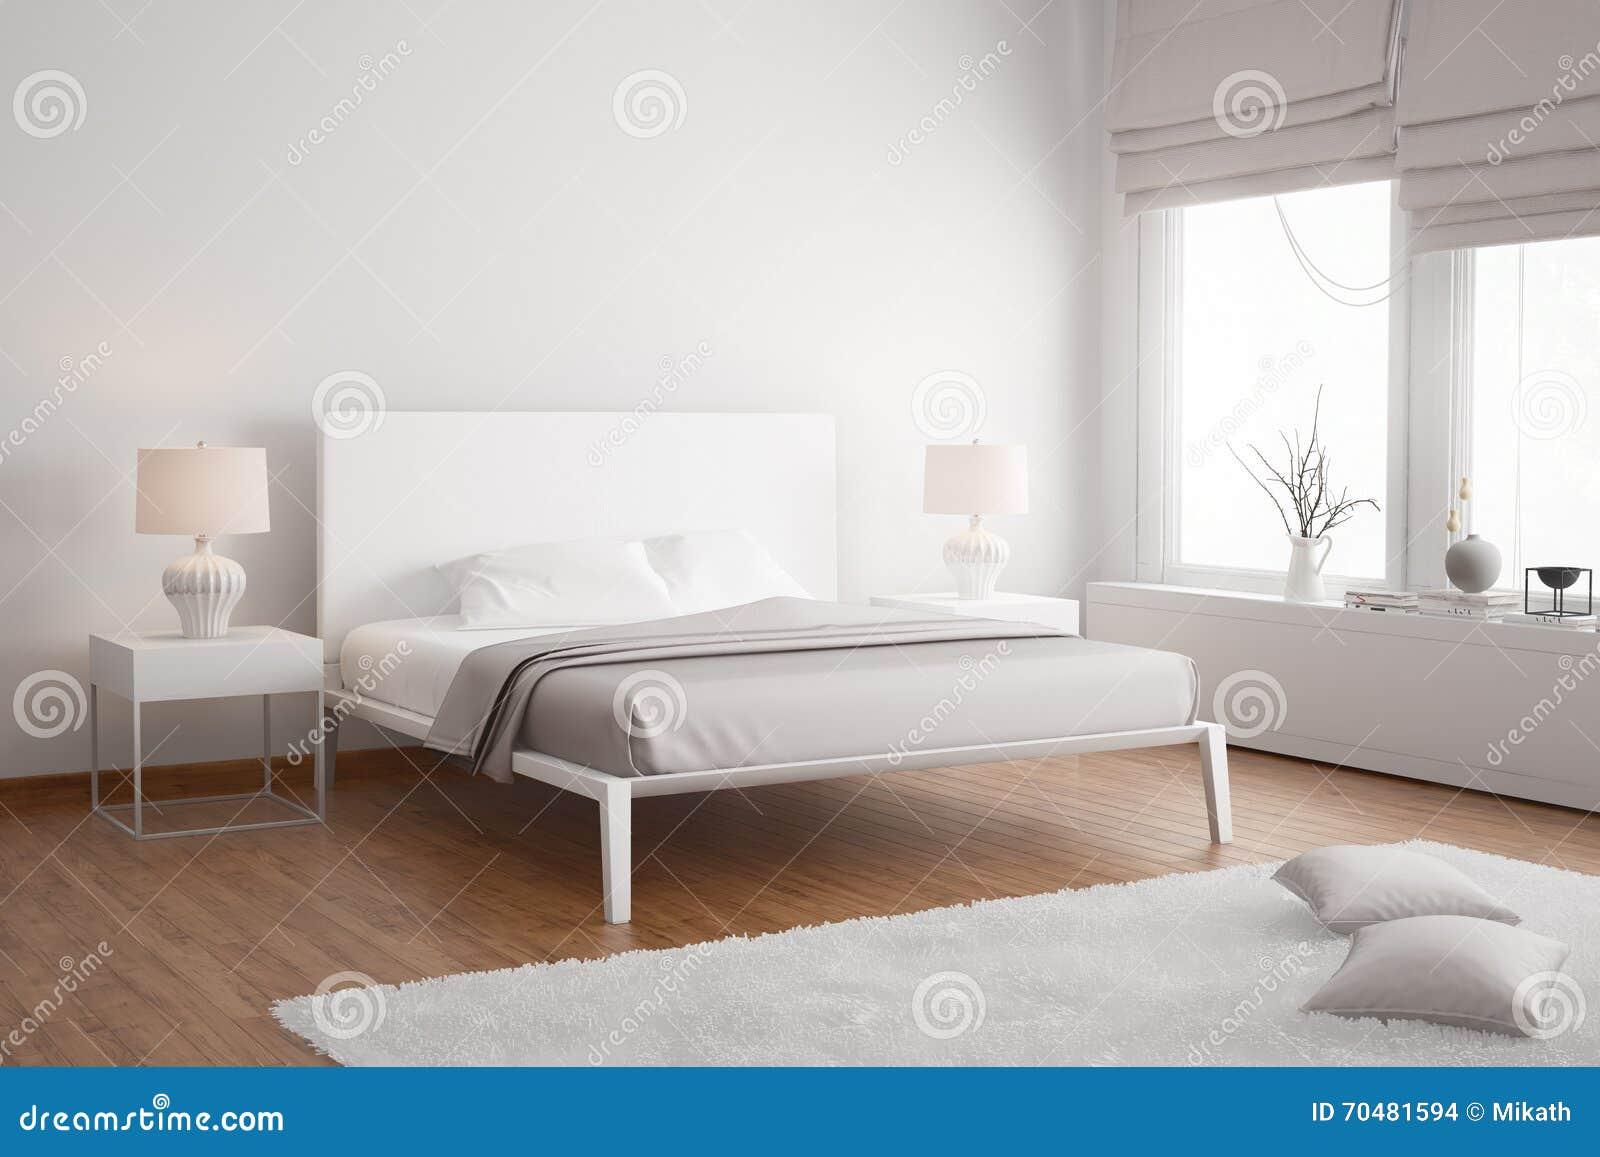 Chambre a coucher blanche et mauve for Chambre contemporaine blanche